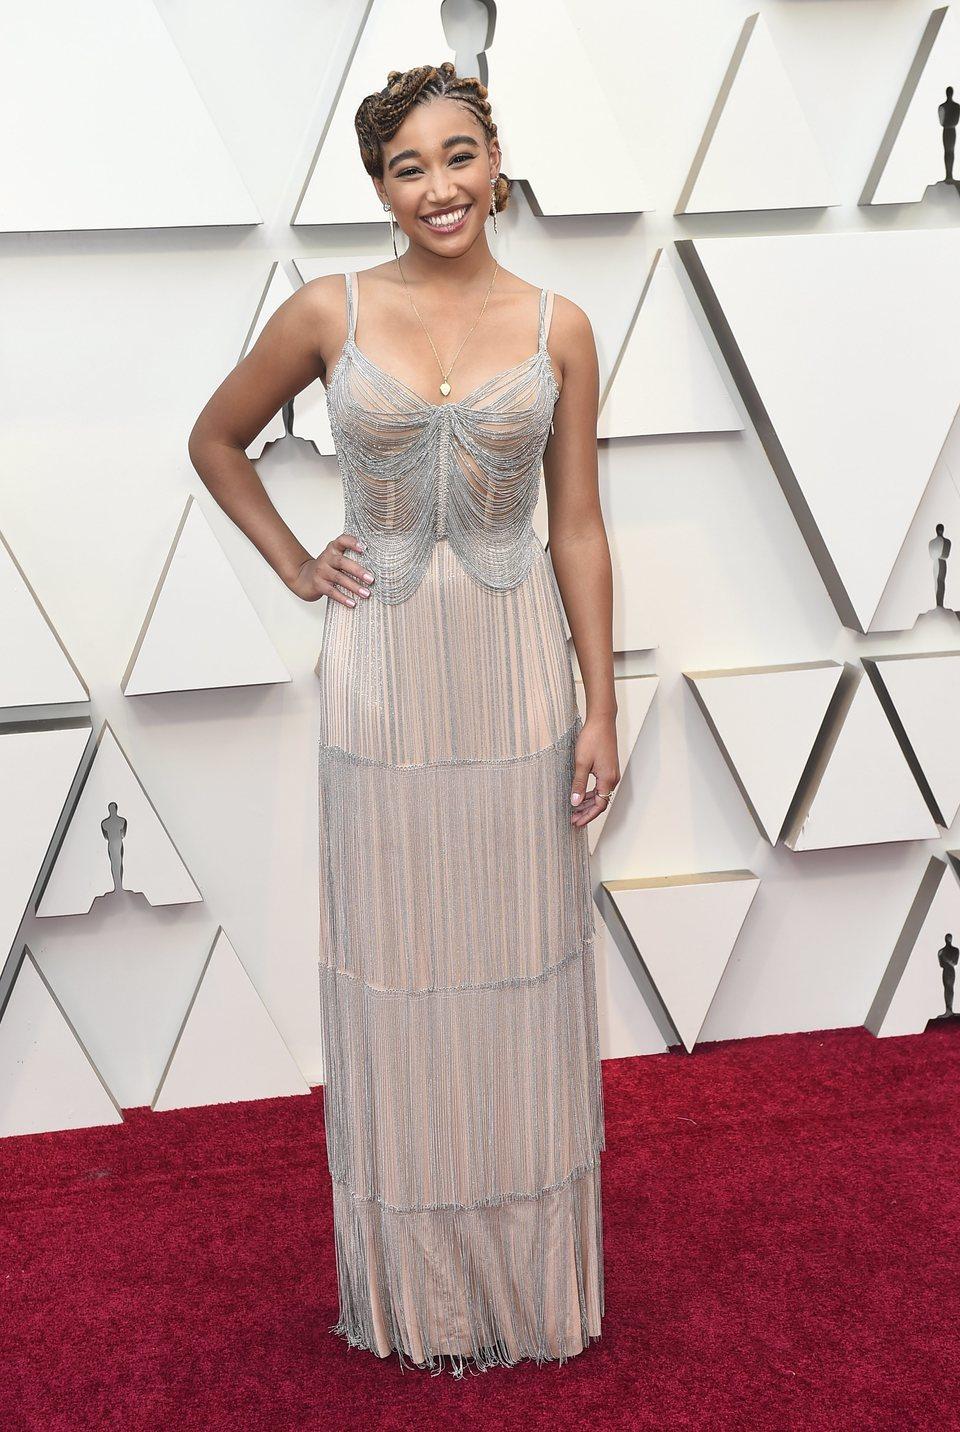 Amandla Stenberg at the Oscars 2019 red carpet